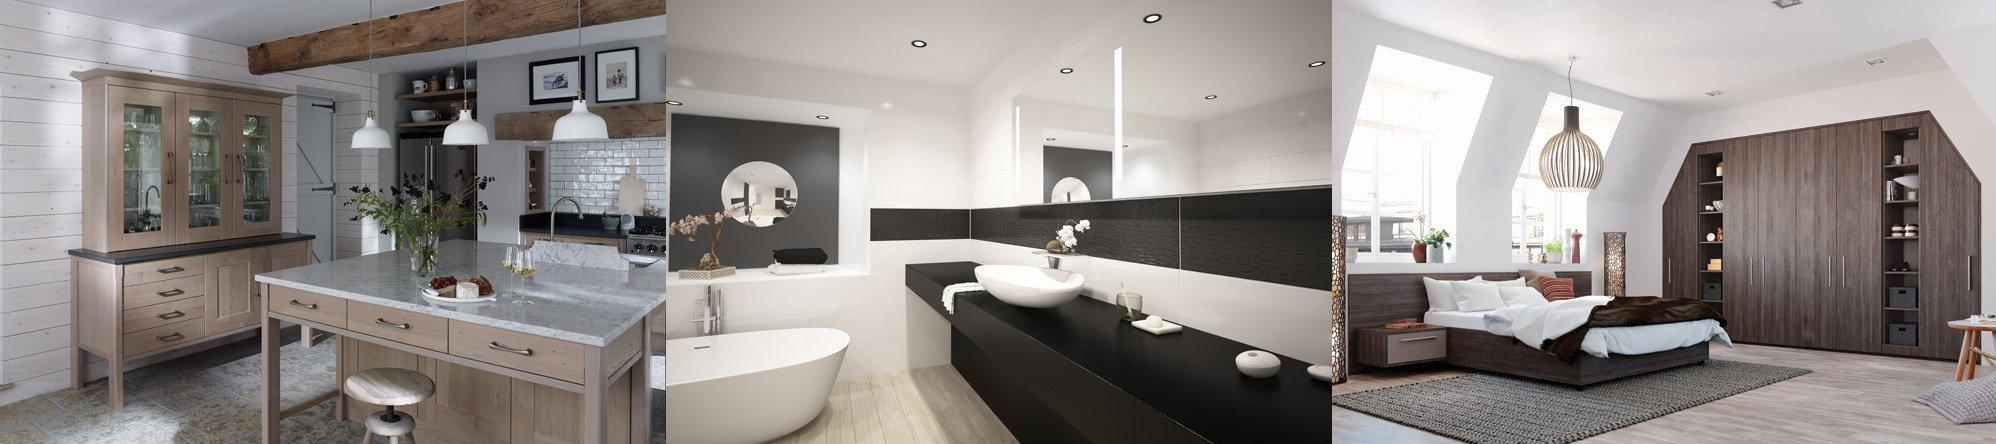 Principal Kitchens Bathrooms New Kitchen County Durham